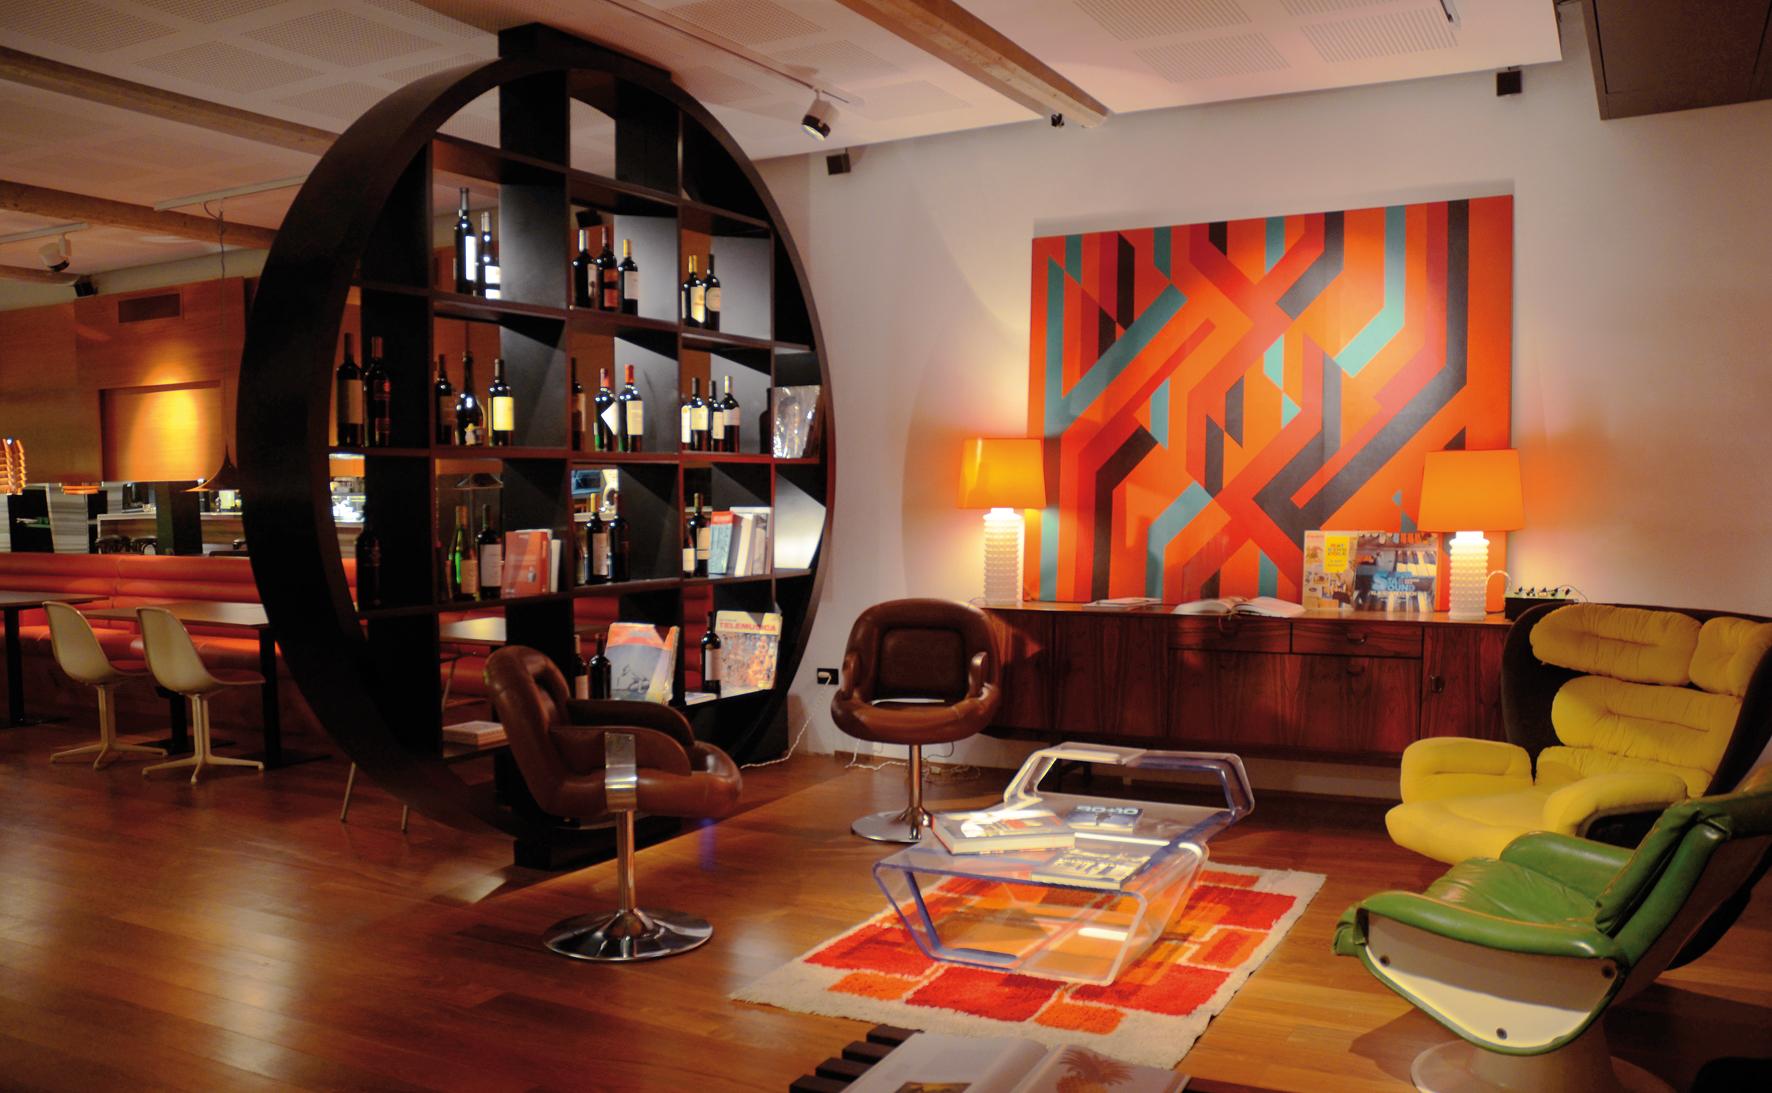 Interior Design Vintage Interior Design: The Nostalgic Style 60s